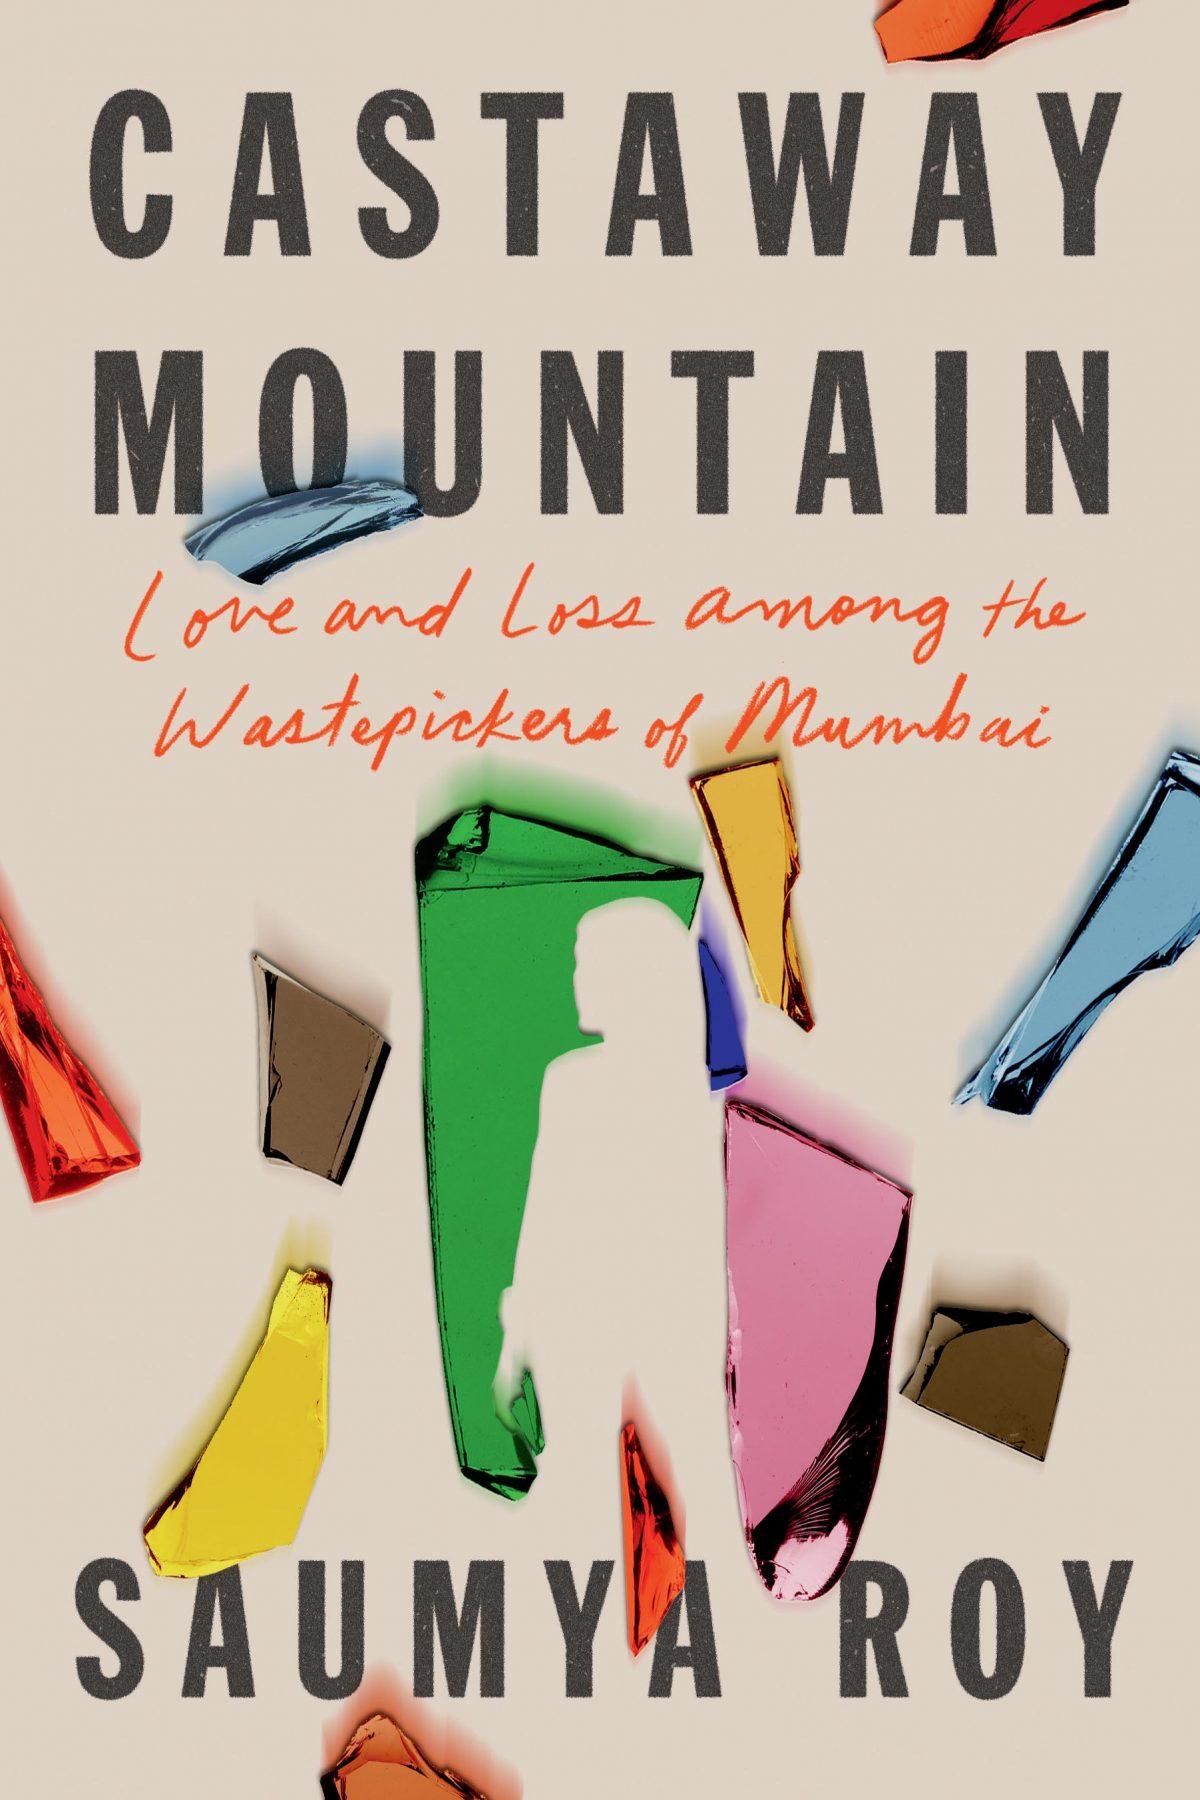 Castaway Mountain book jacket.